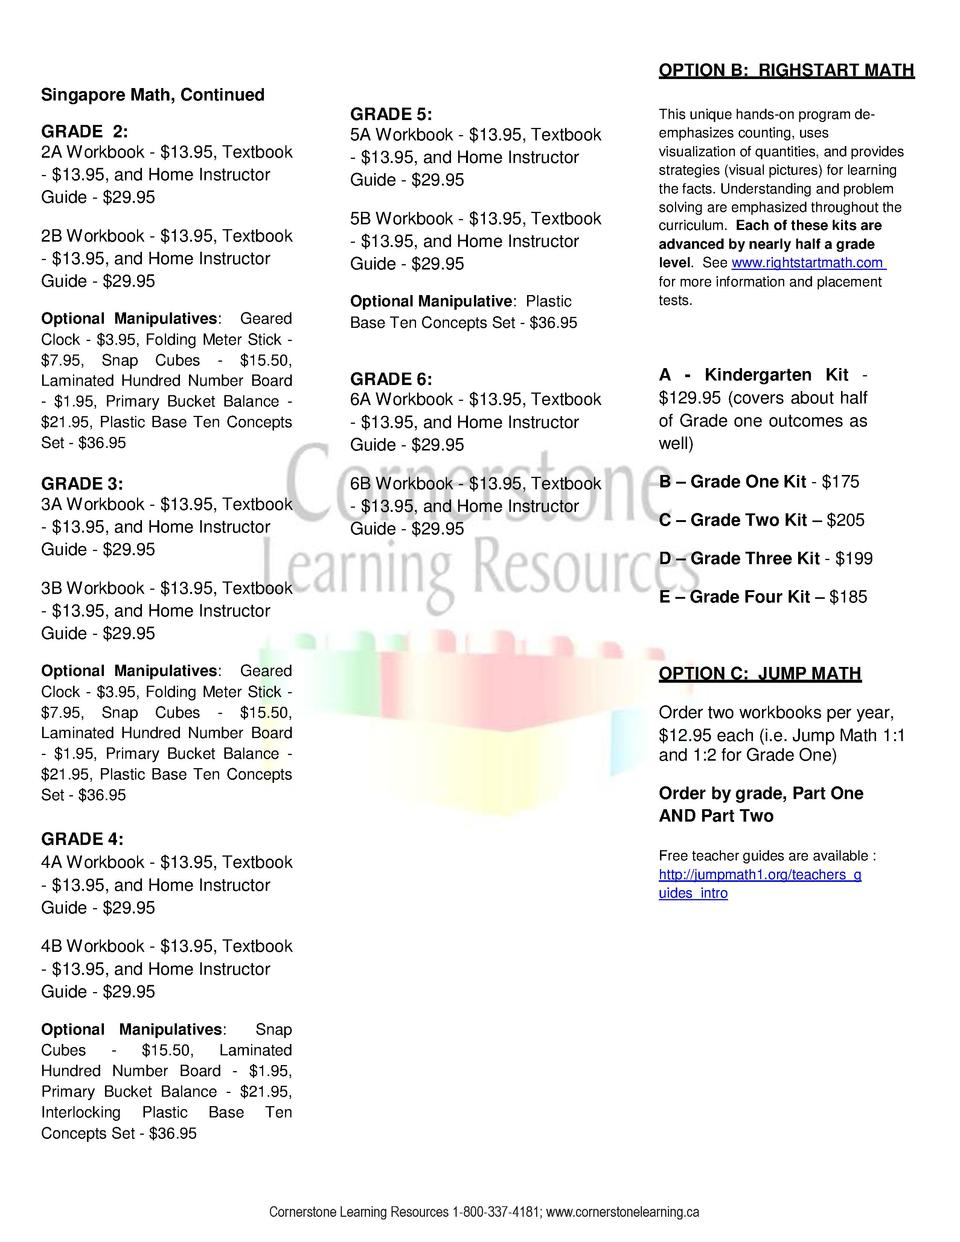 Uncategorized Math Makes Sense 3 Worksheets 100 math makes sense 3 workbook pdf guided groups hcos curriculum packages 2014 simplebooklet com option b righstart singapore continued gr